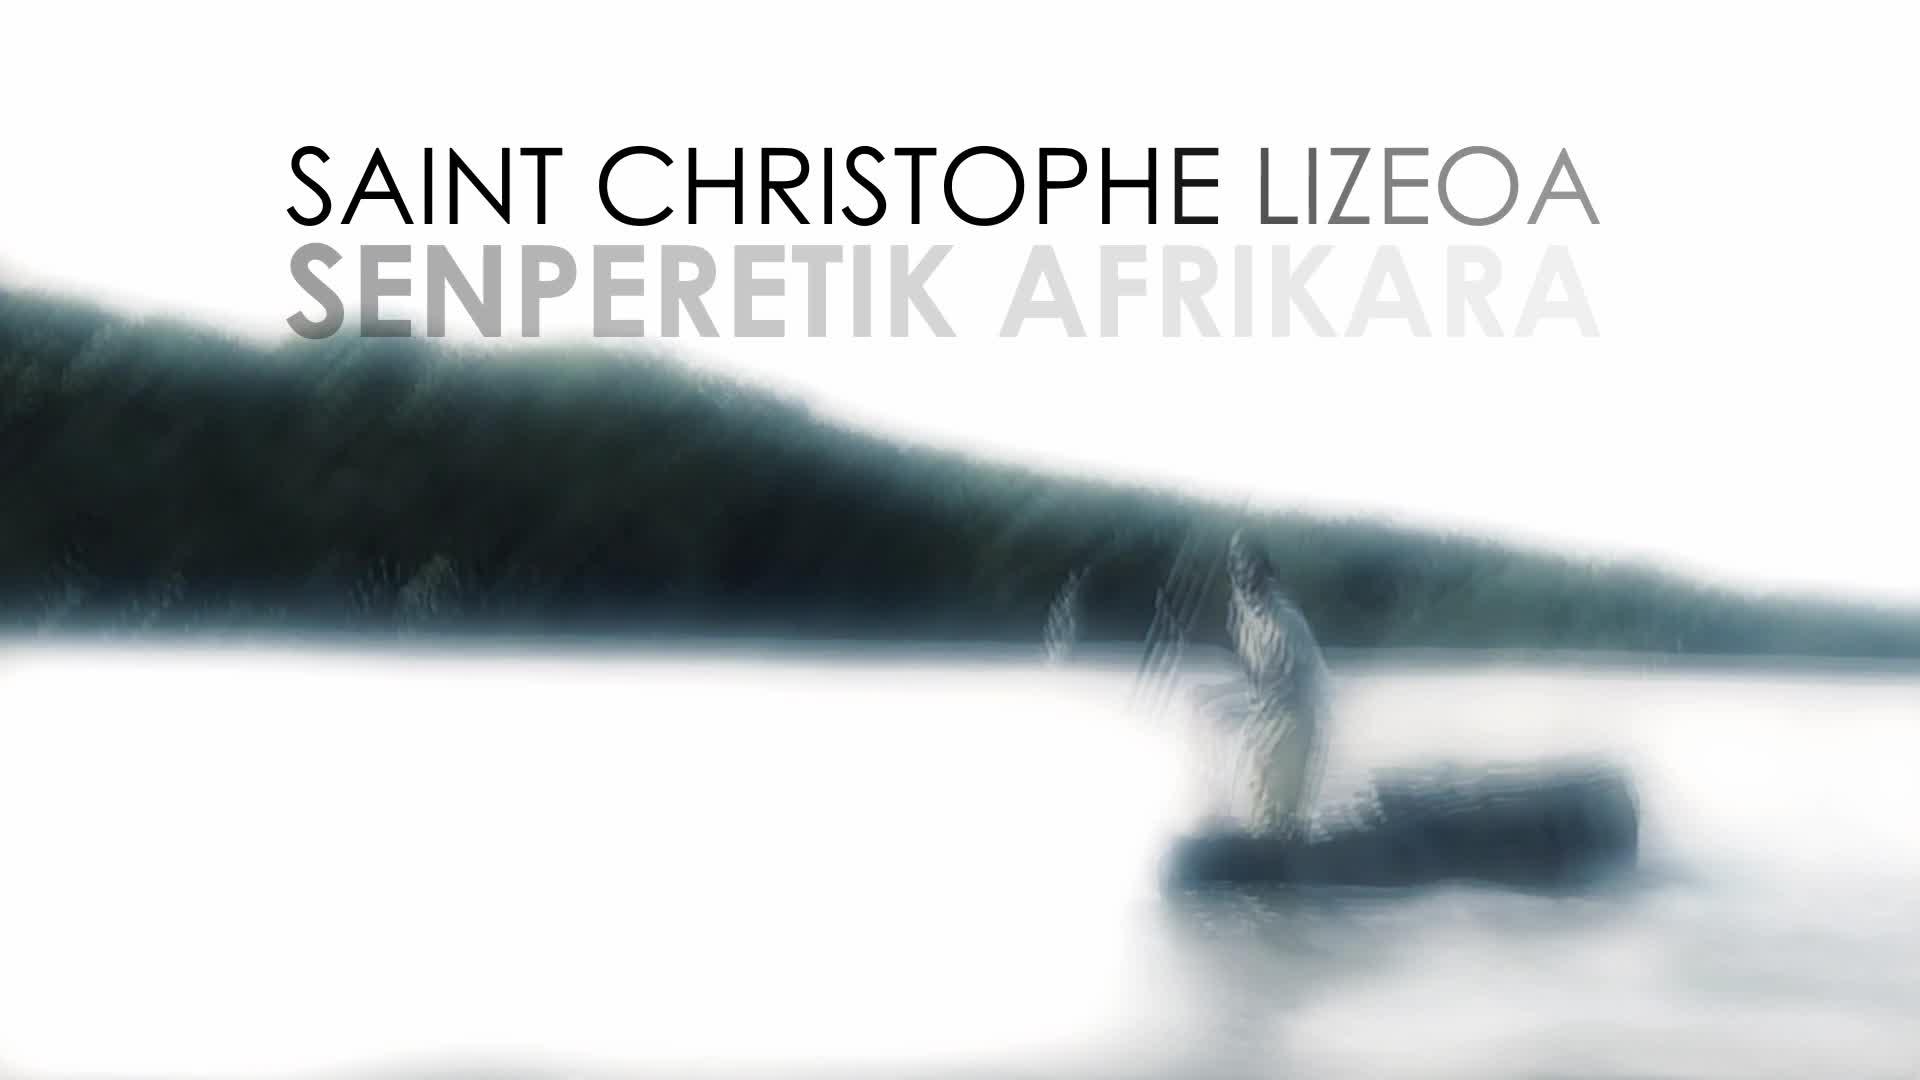 Saint Christophe lizeoa Senperetik Afrikara